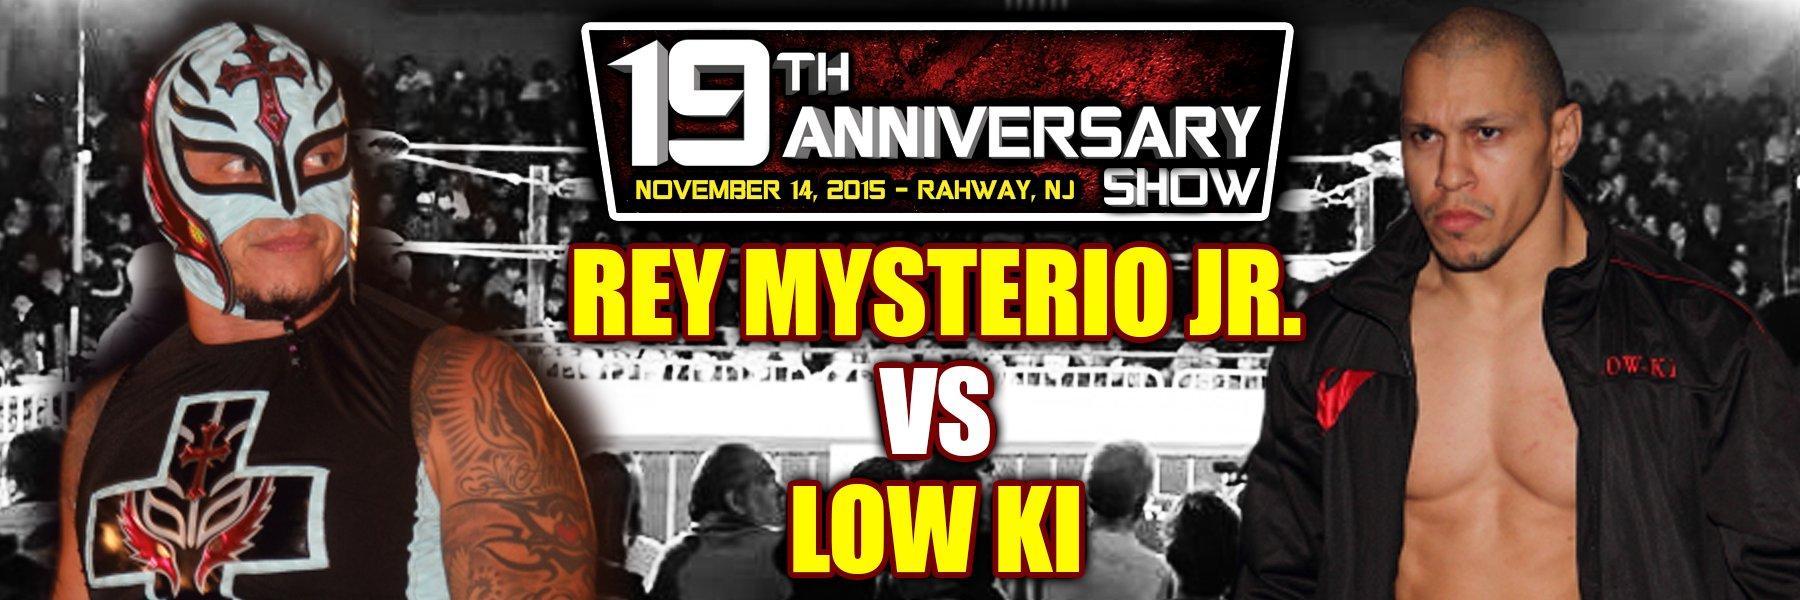 Watch Rey Mysterio Jr vs Low Ki, LAX returns to JAPW, and more!